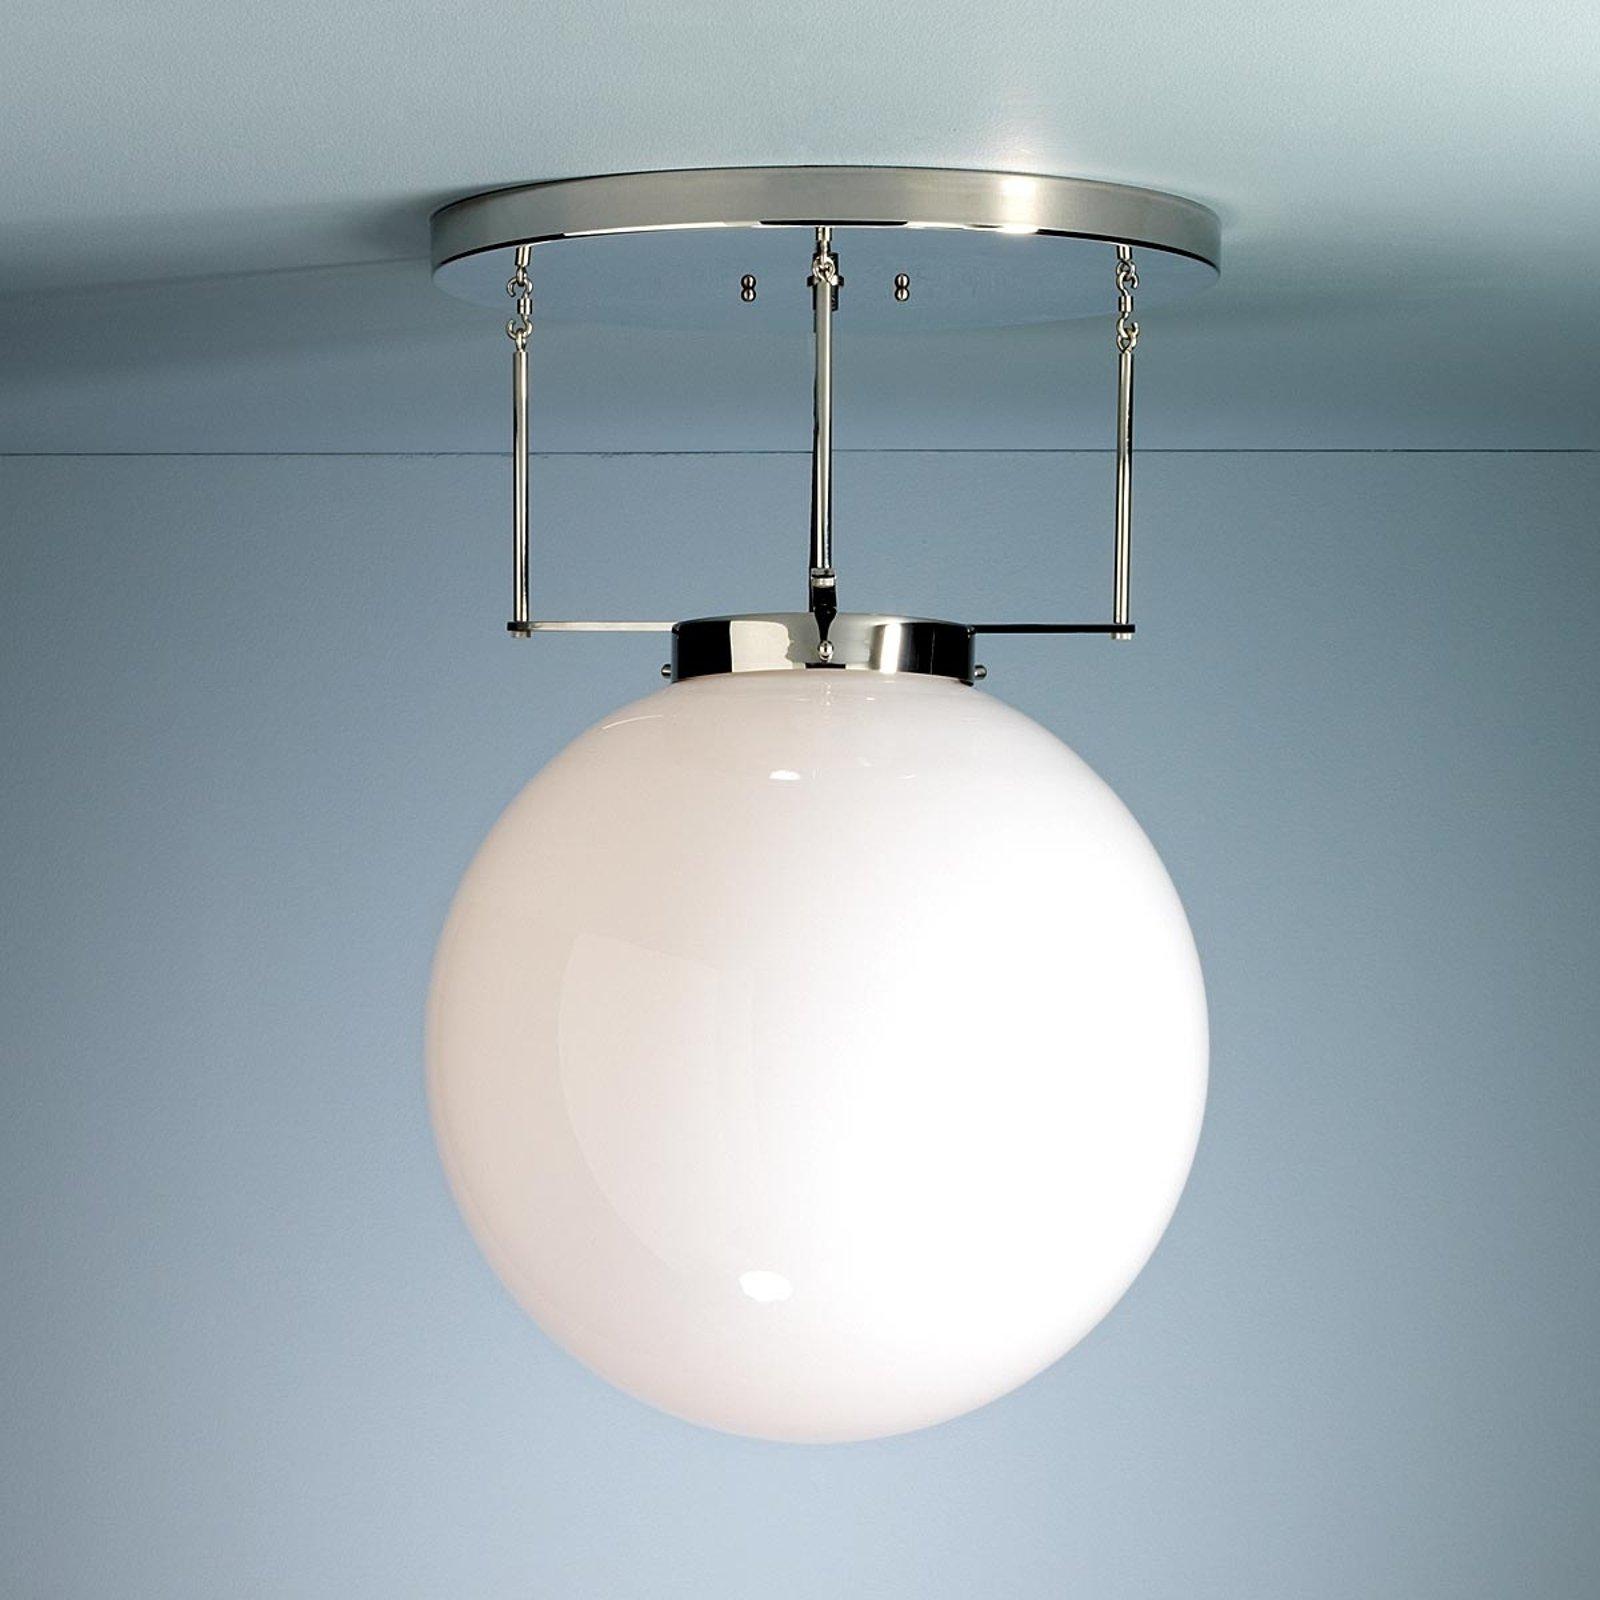 Brandts taklampe i Bauhaus-stil nikkel 40 cm